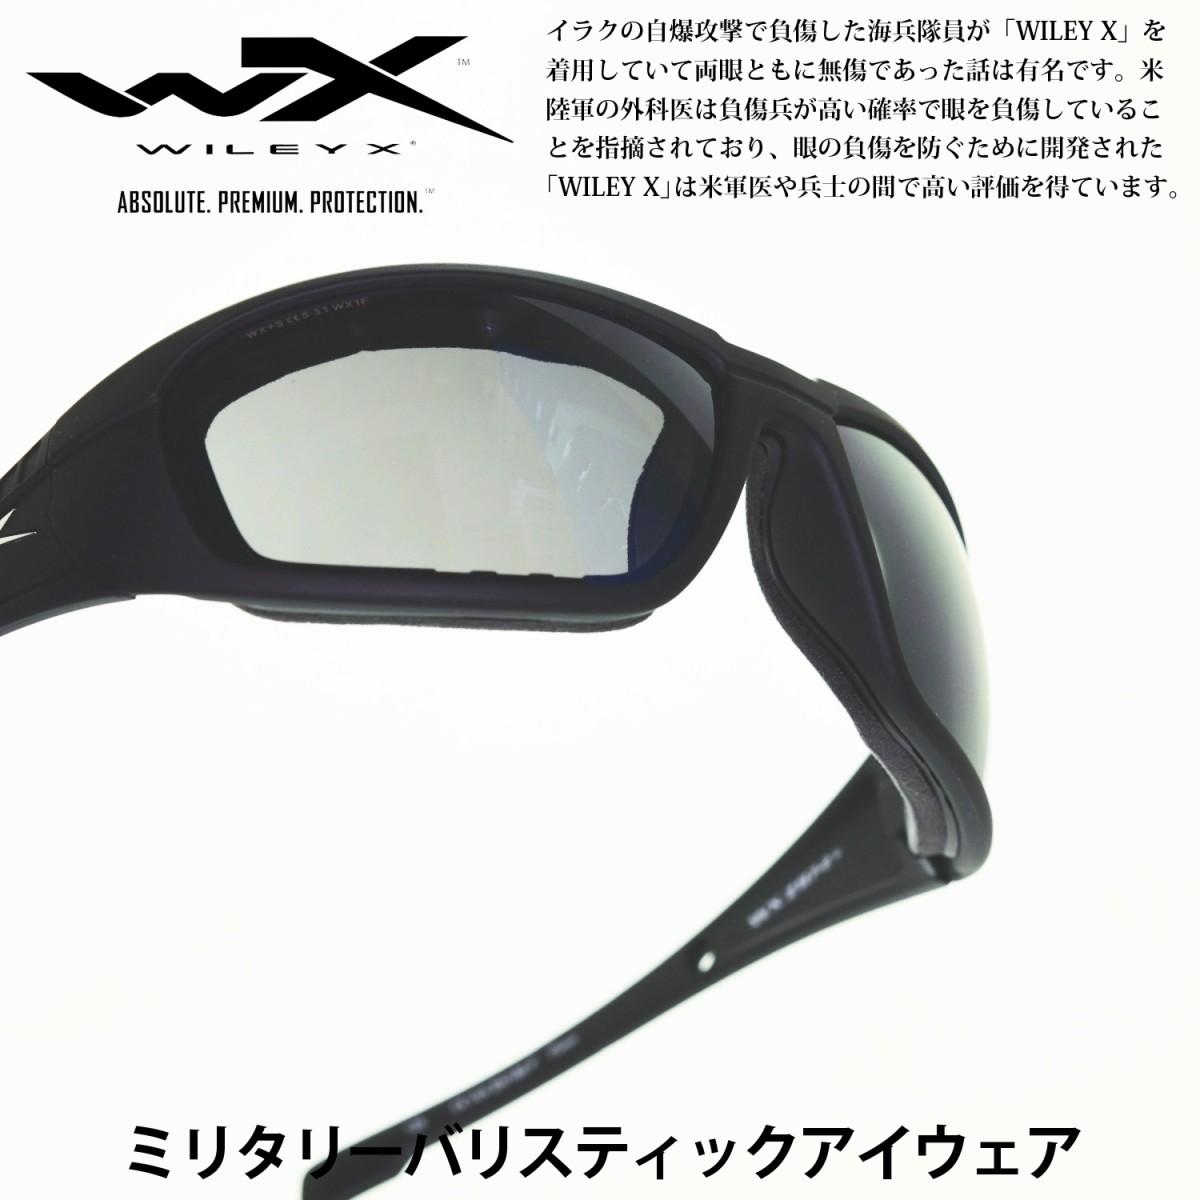 WILEY X ワイリーエックスBOSS ボスMatte Black Silver Flash/Smoke Grey